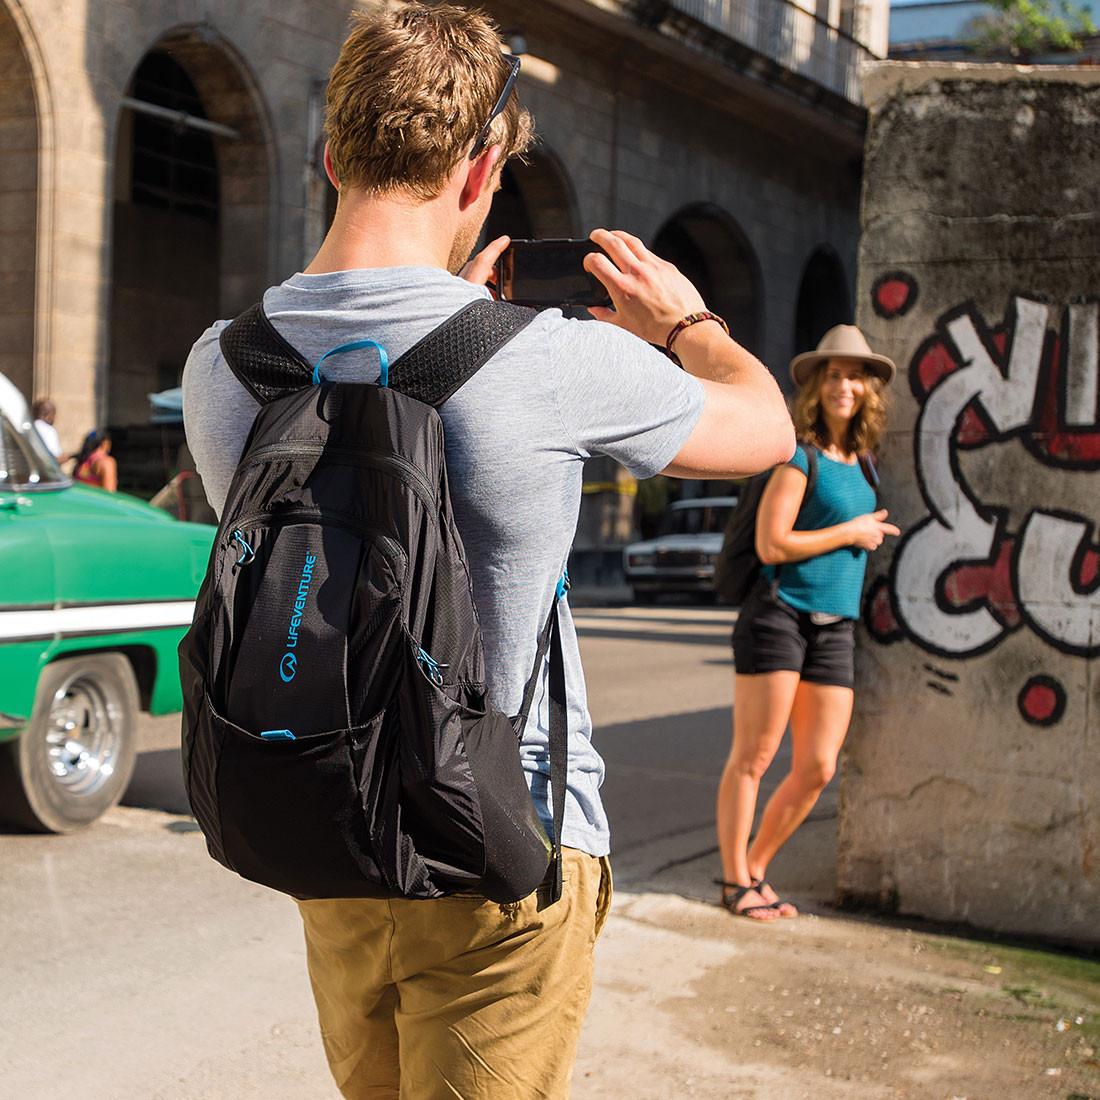 23e5dd4fa Sbalitelný batoh Lifeventure Packable Backpack černý, 231 g | Pod 7 kilo